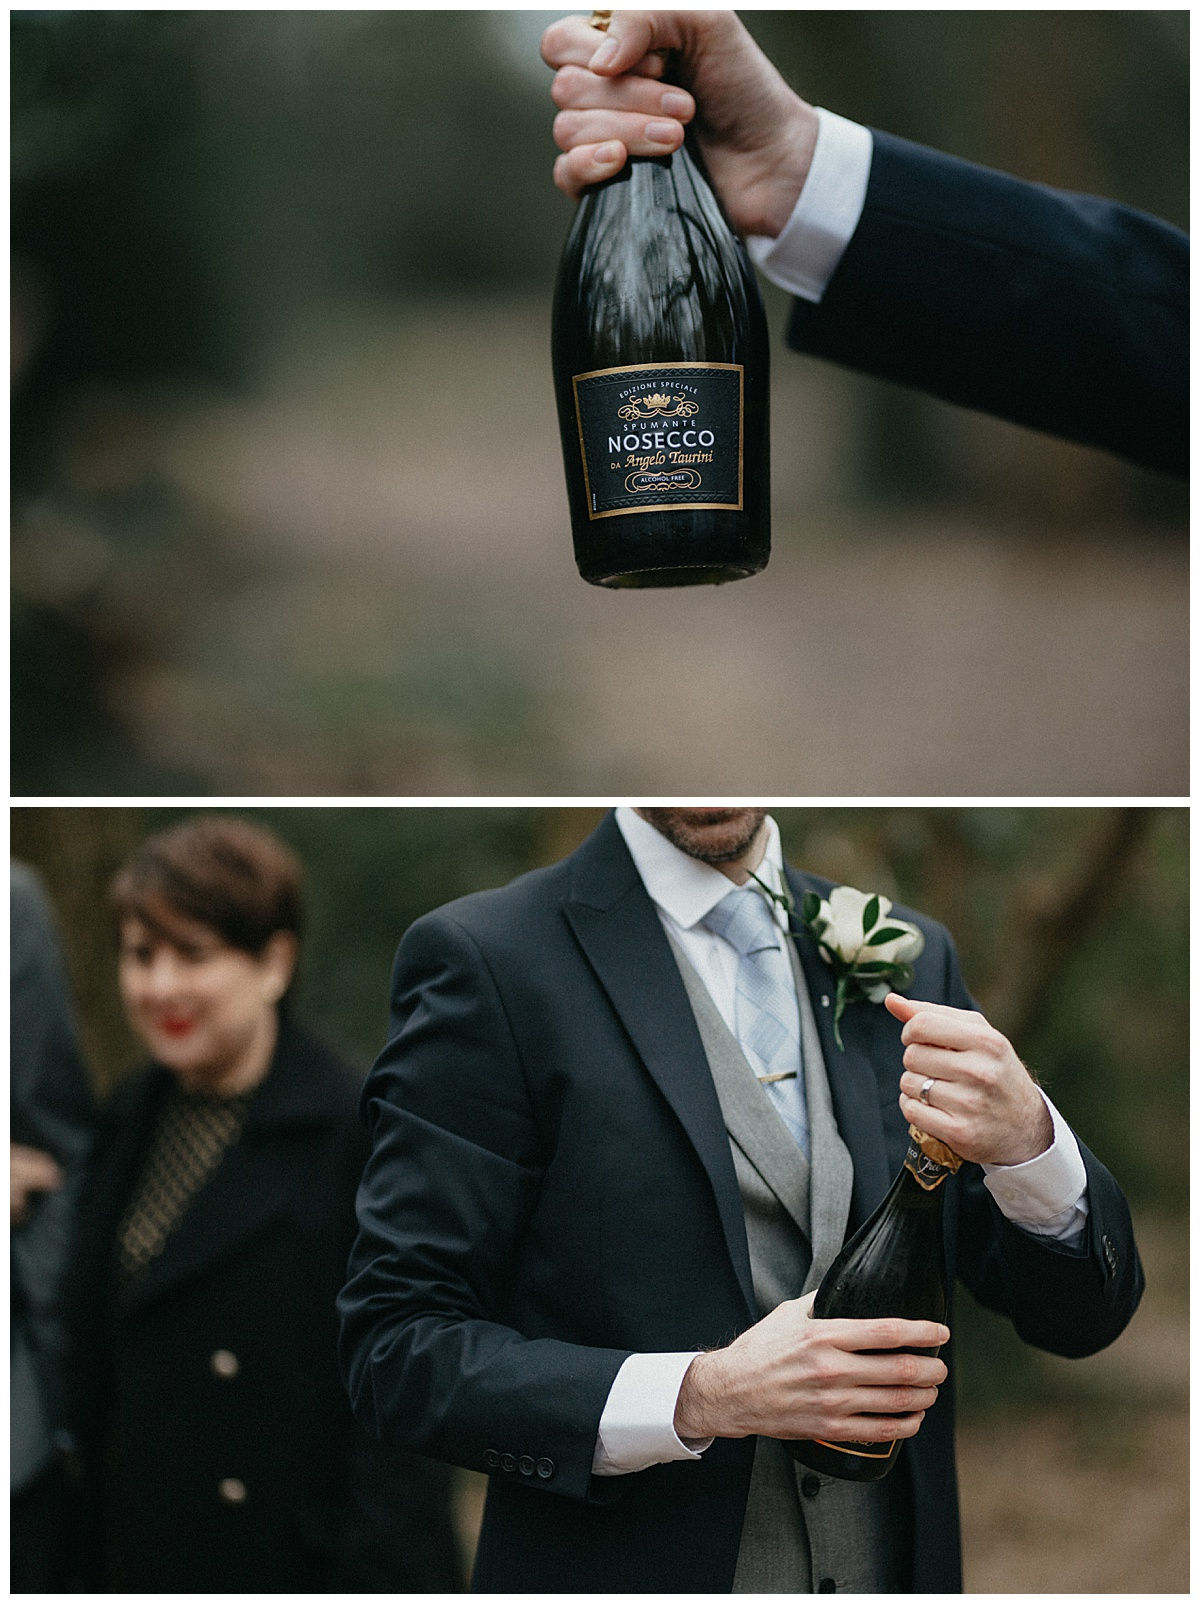 Groom opening champagne bottle